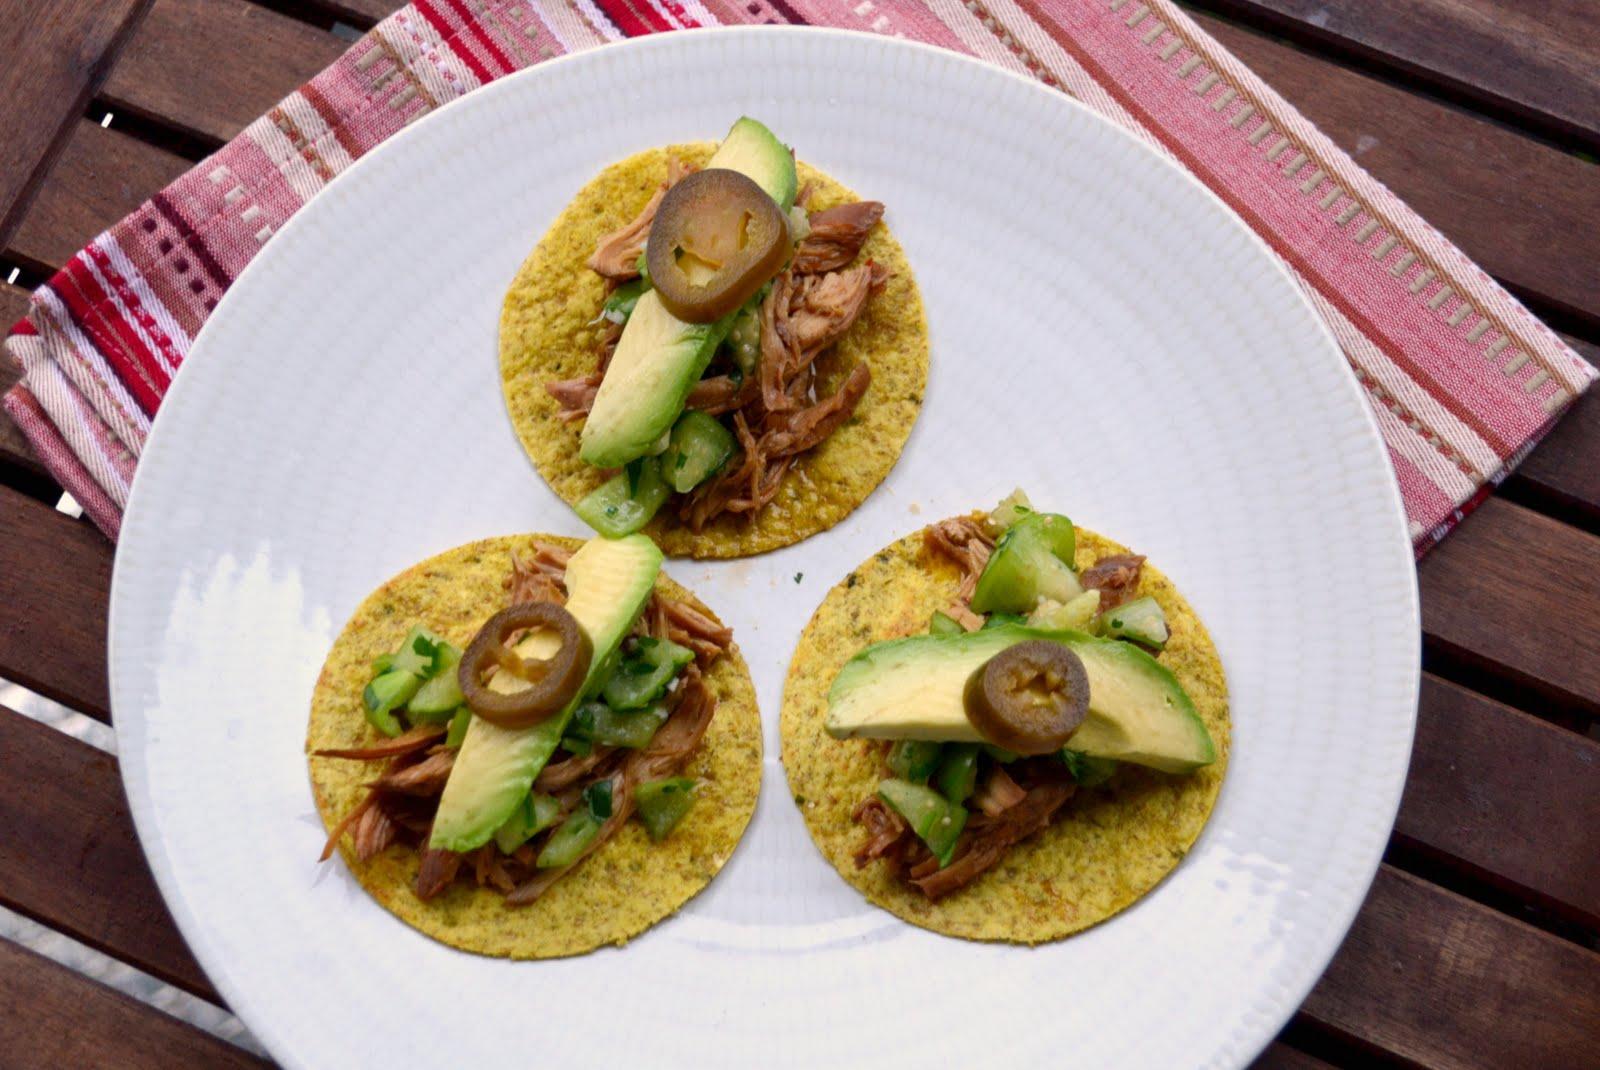 Captivating Asian Tacos With Tomatillo Salsa Recipe